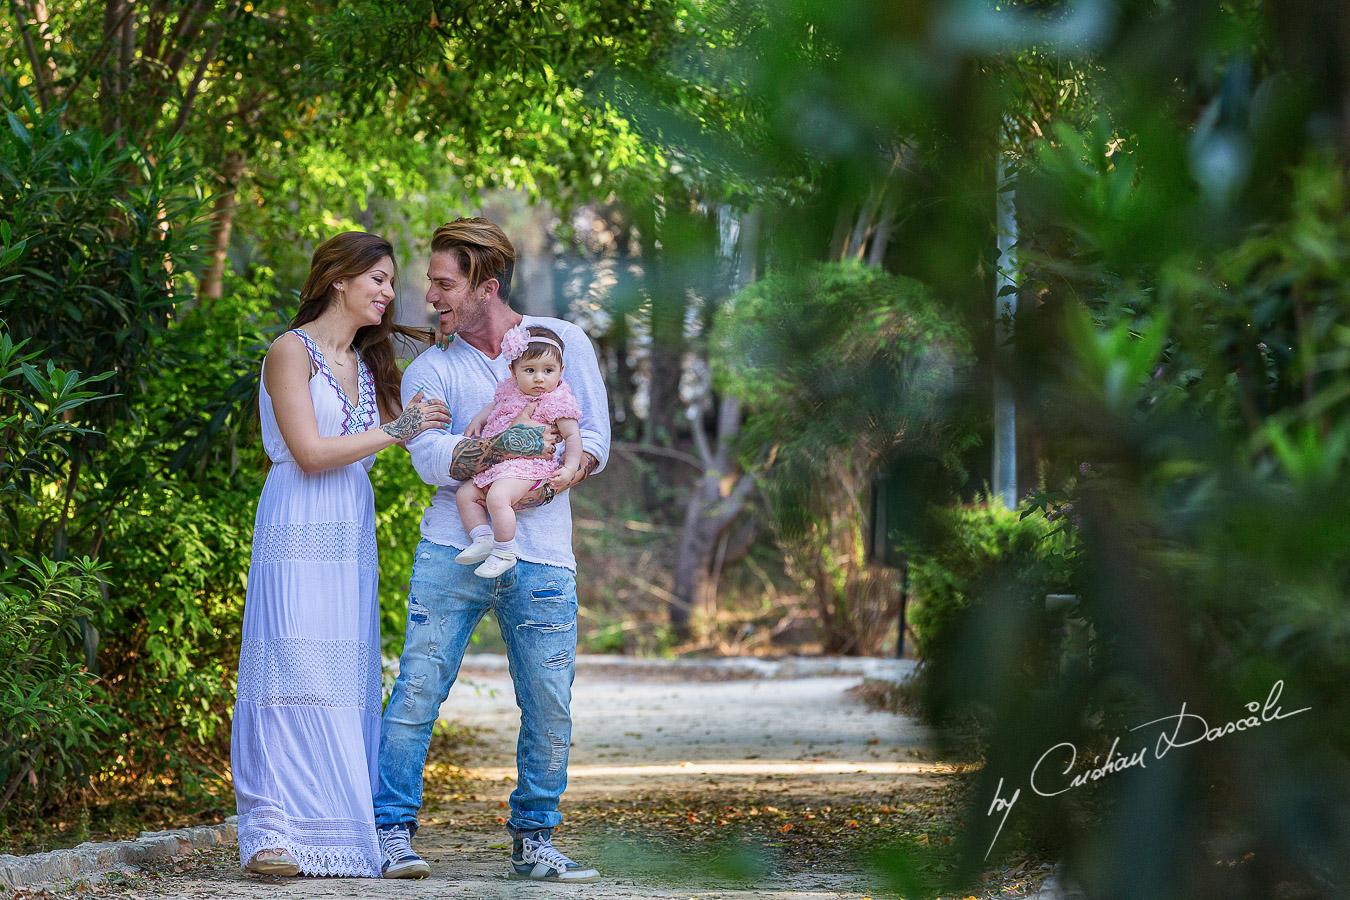 Family Photo Session in Nicosia - 12